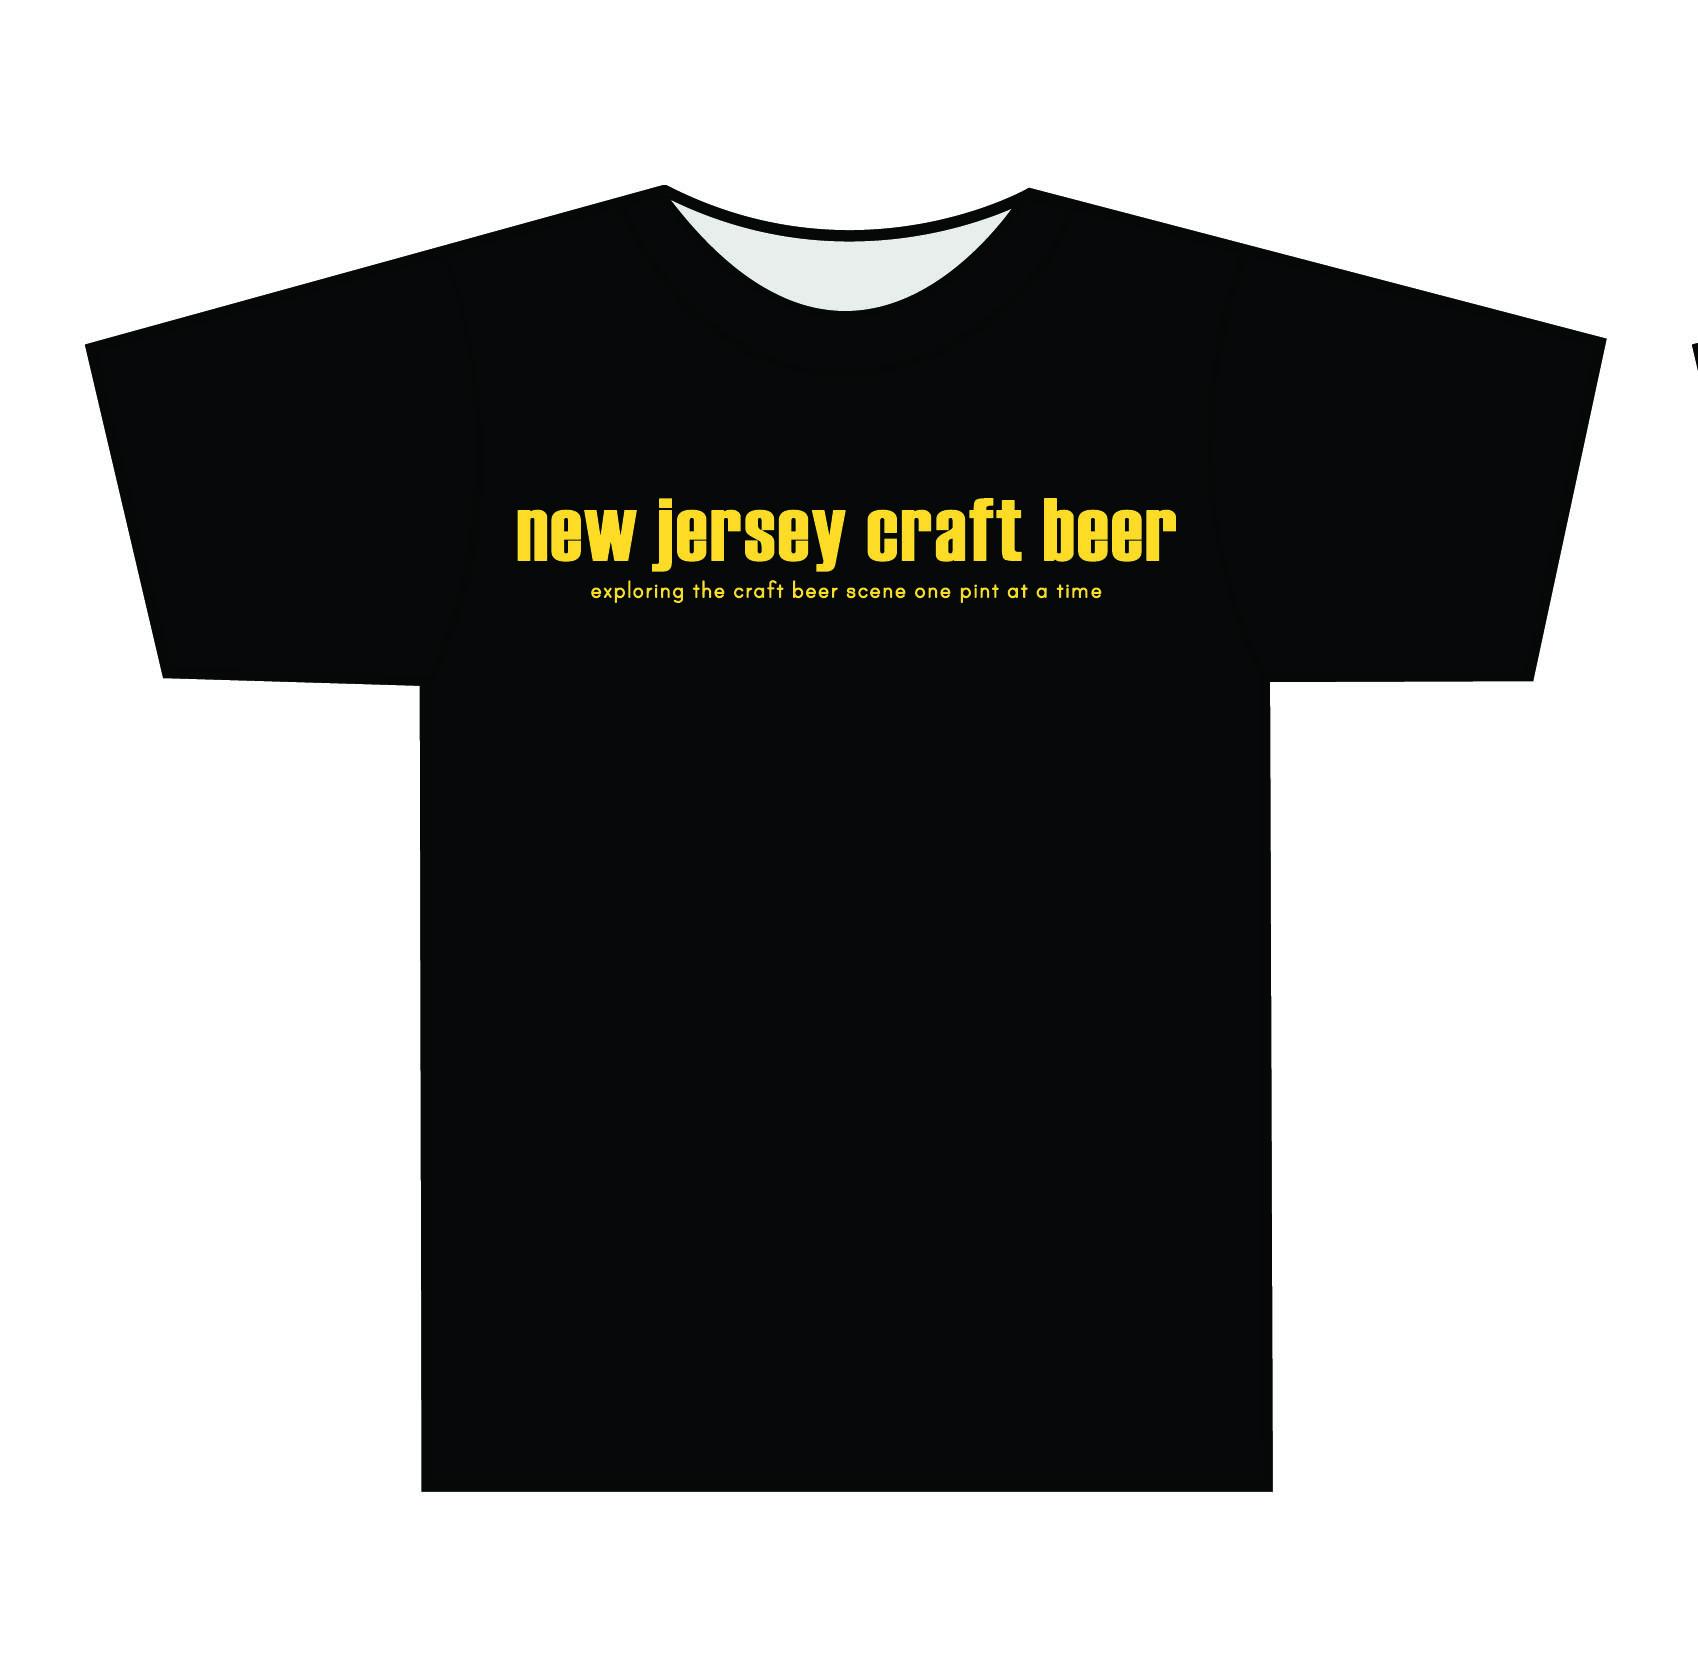 Best shirt design joy studio design gallery best design - Best Designs For Tshirt Joy Studio Design Gallery Best Design